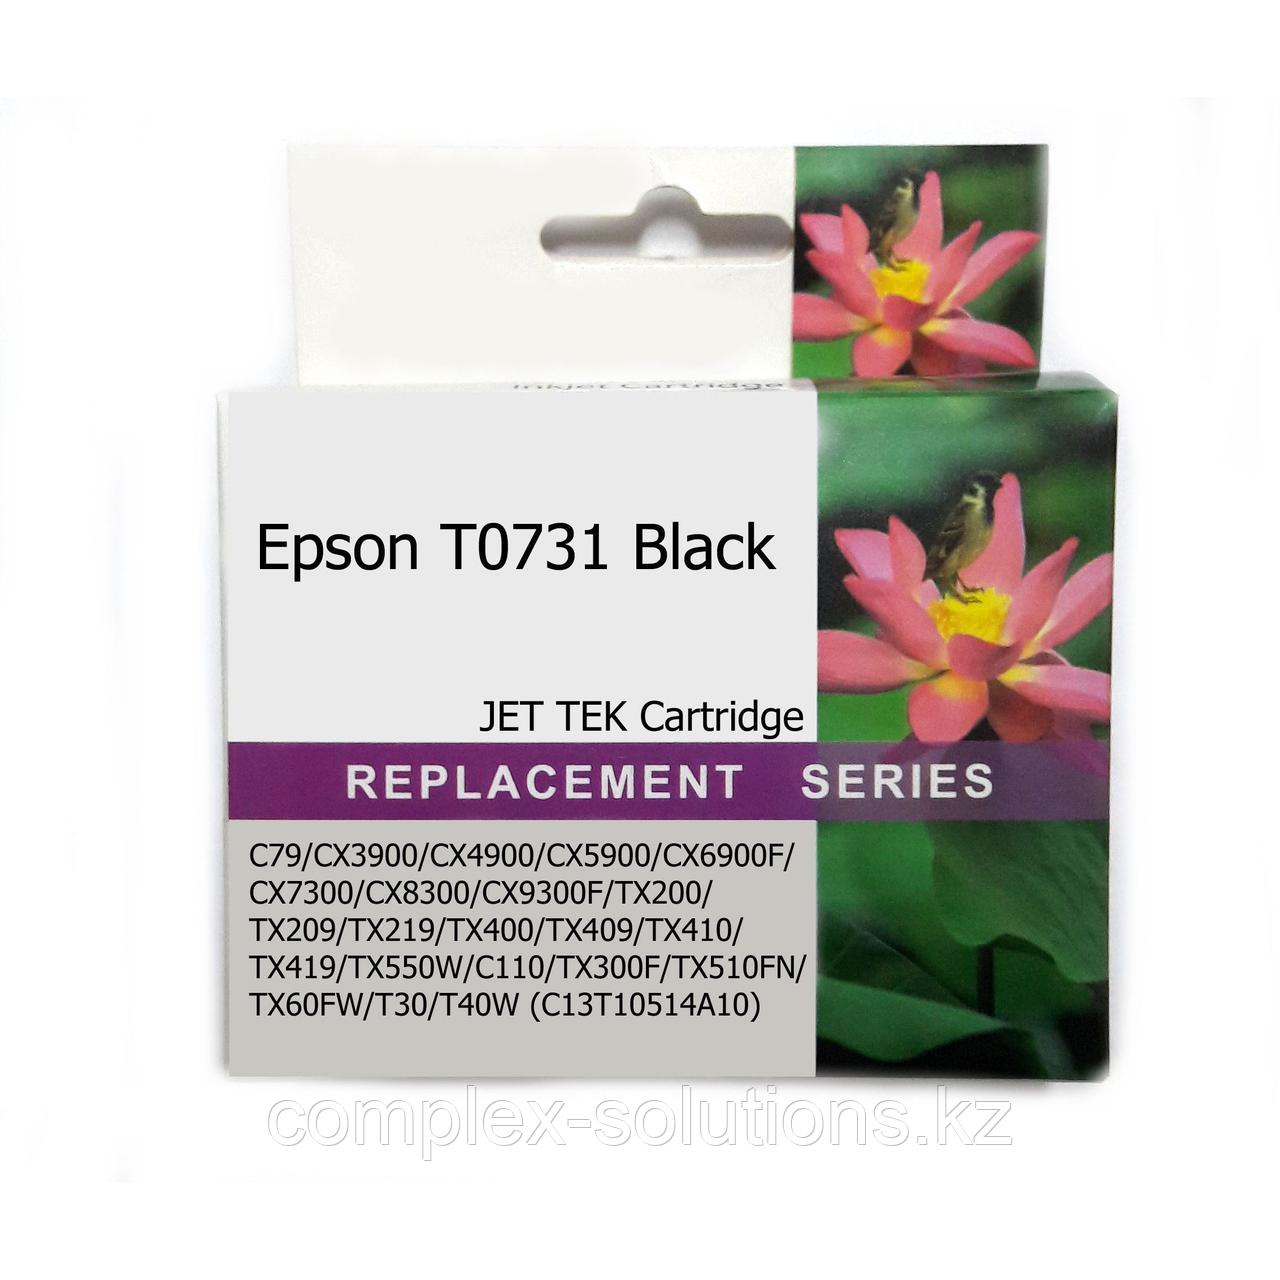 Картридж EPSON T0731 Black JET TEK | [качественный дубликат]